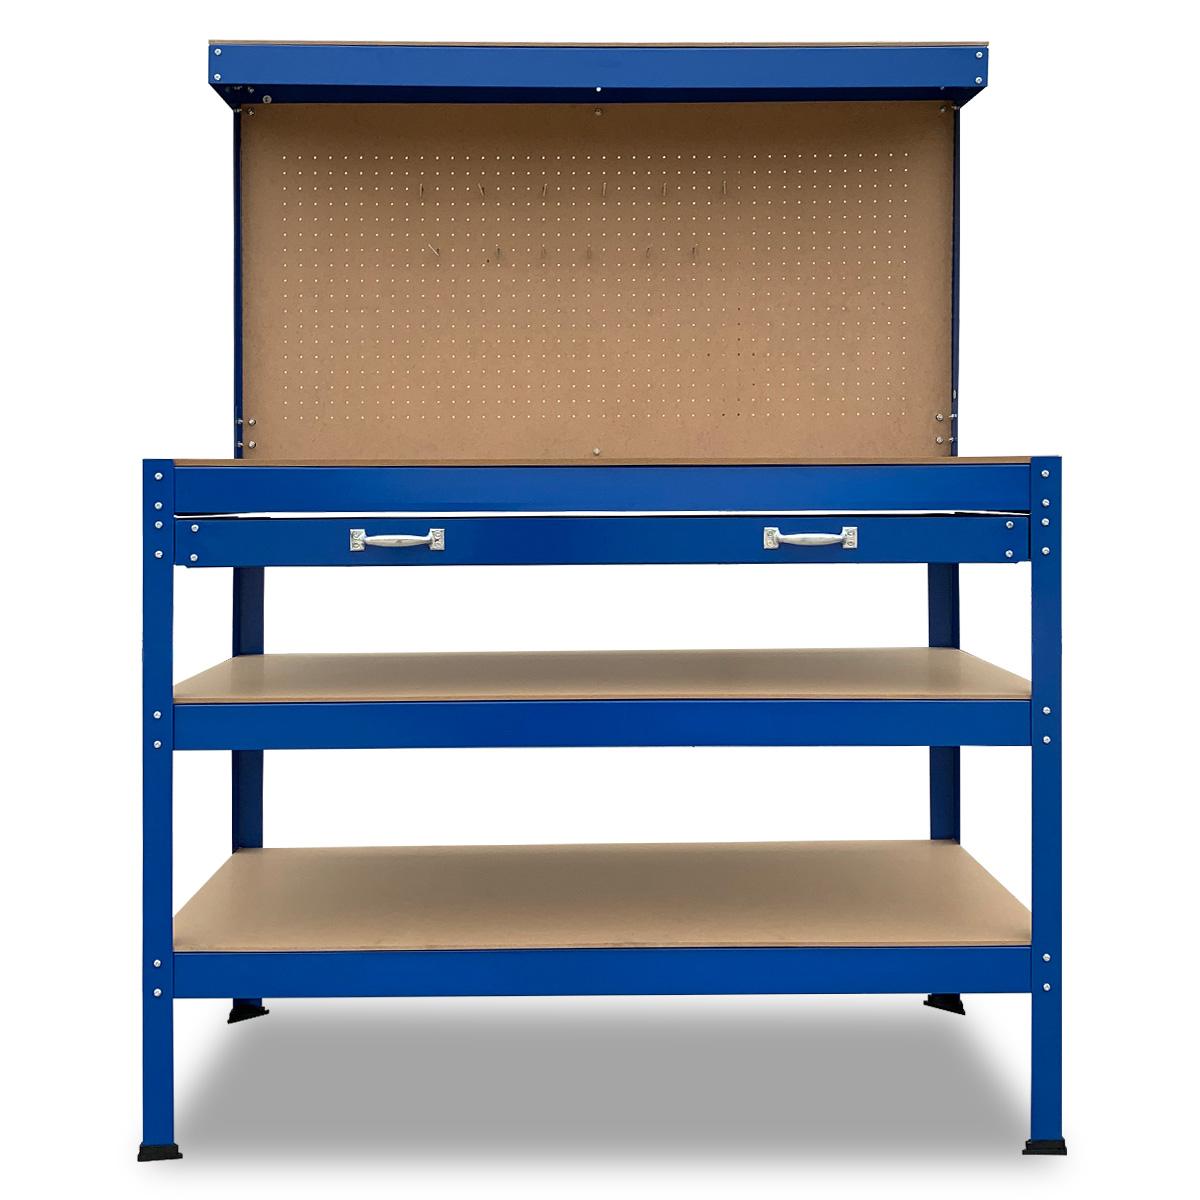 3-Layered Work Bench Garage Storage Table Tool Shop Shelf Blue